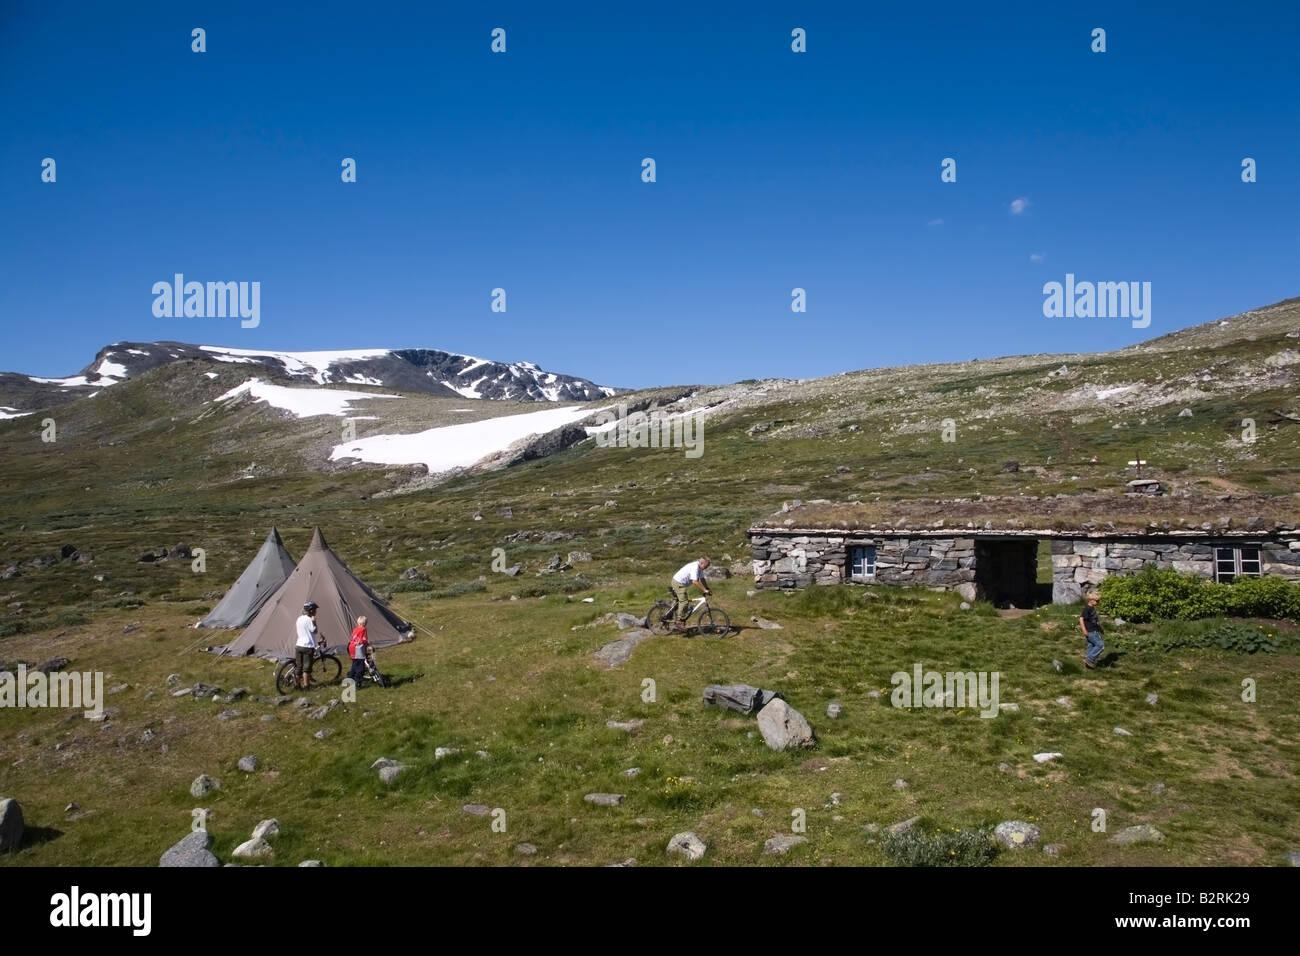 Norway Glittertind Laplander s tents and bikers summer 2008 - Stock Image